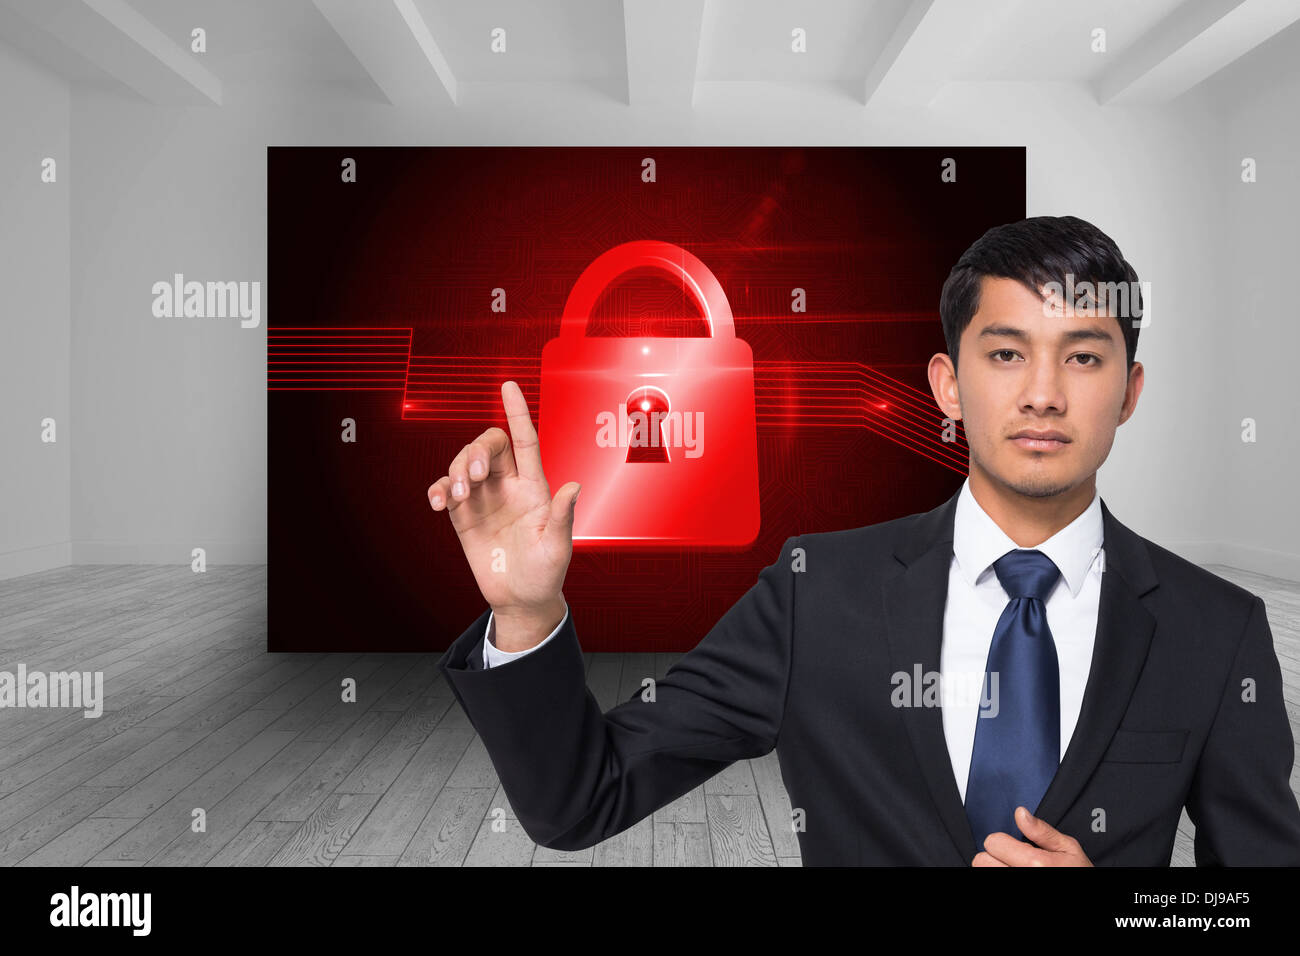 Businessman Touching Virtual Circuit Board Stock Photos Virtualcircuit Composite Image Of Unsmiling